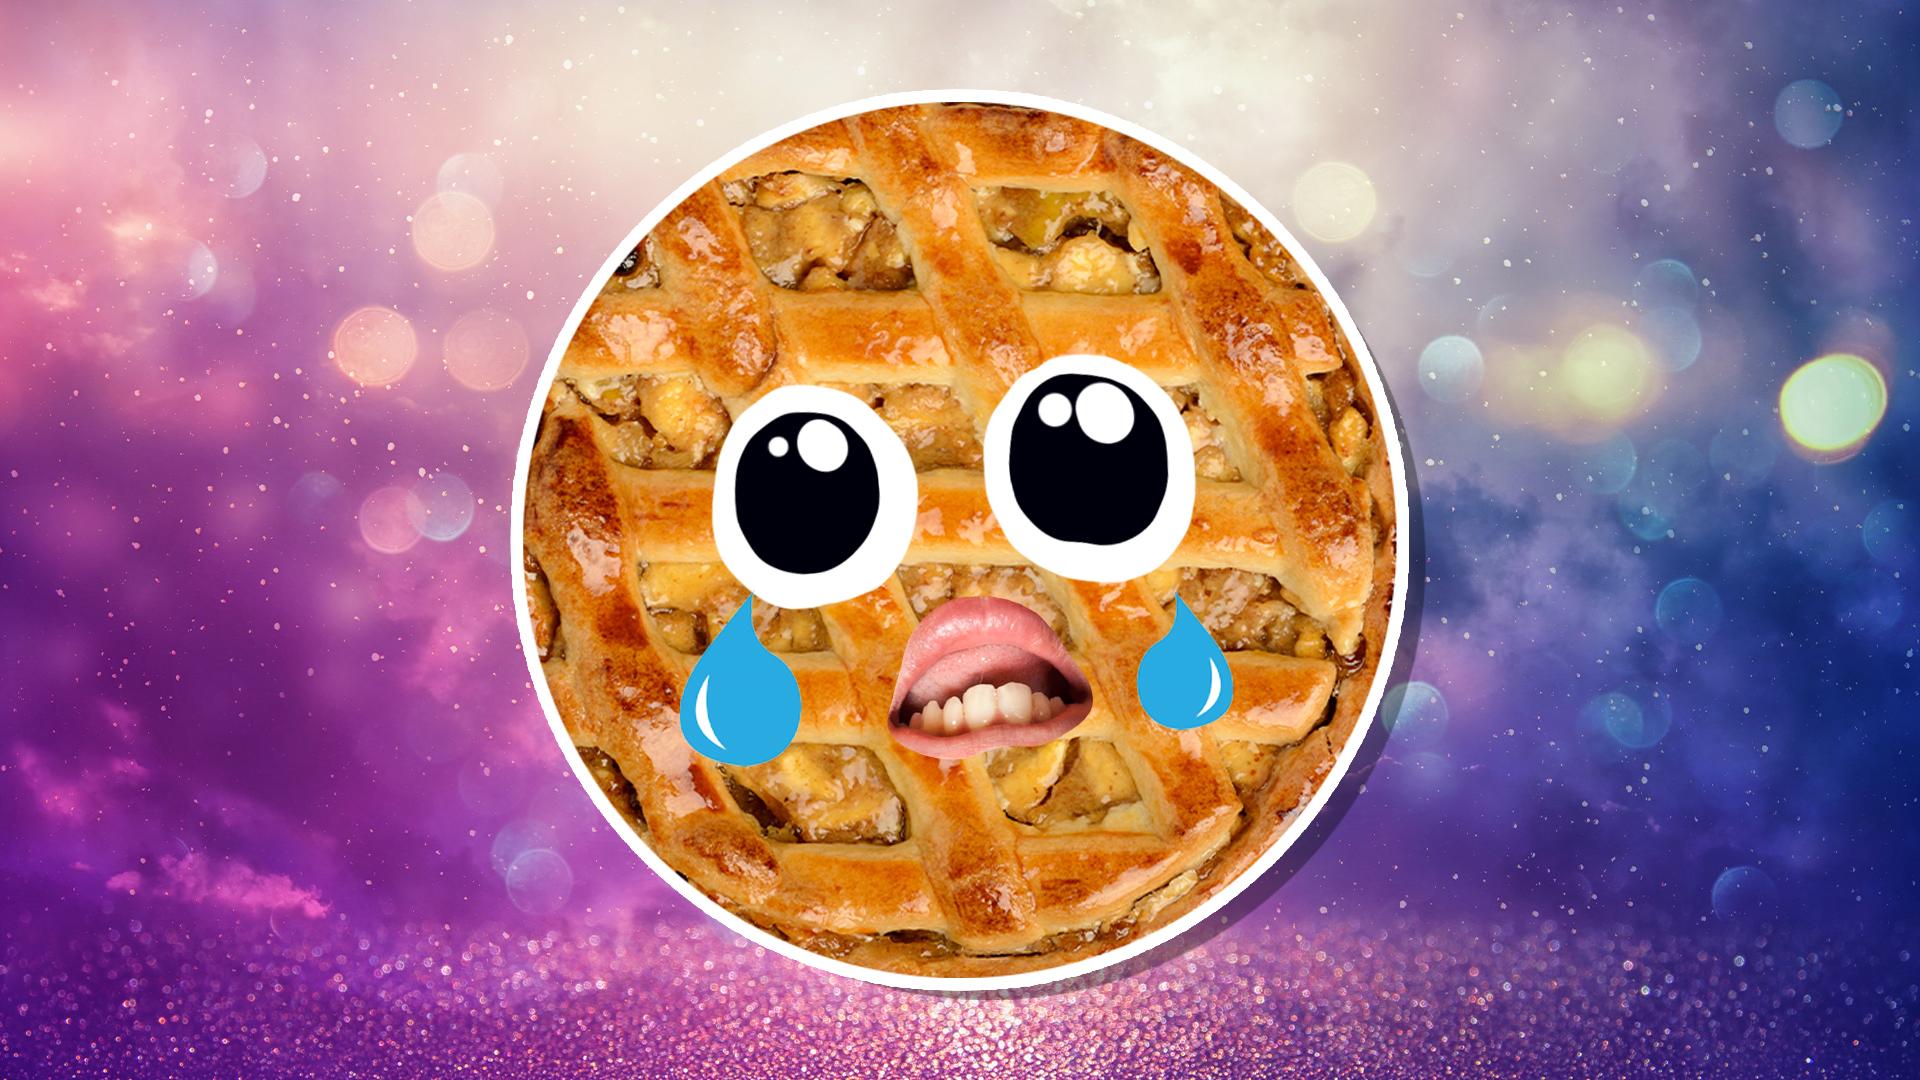 Apple pie cry